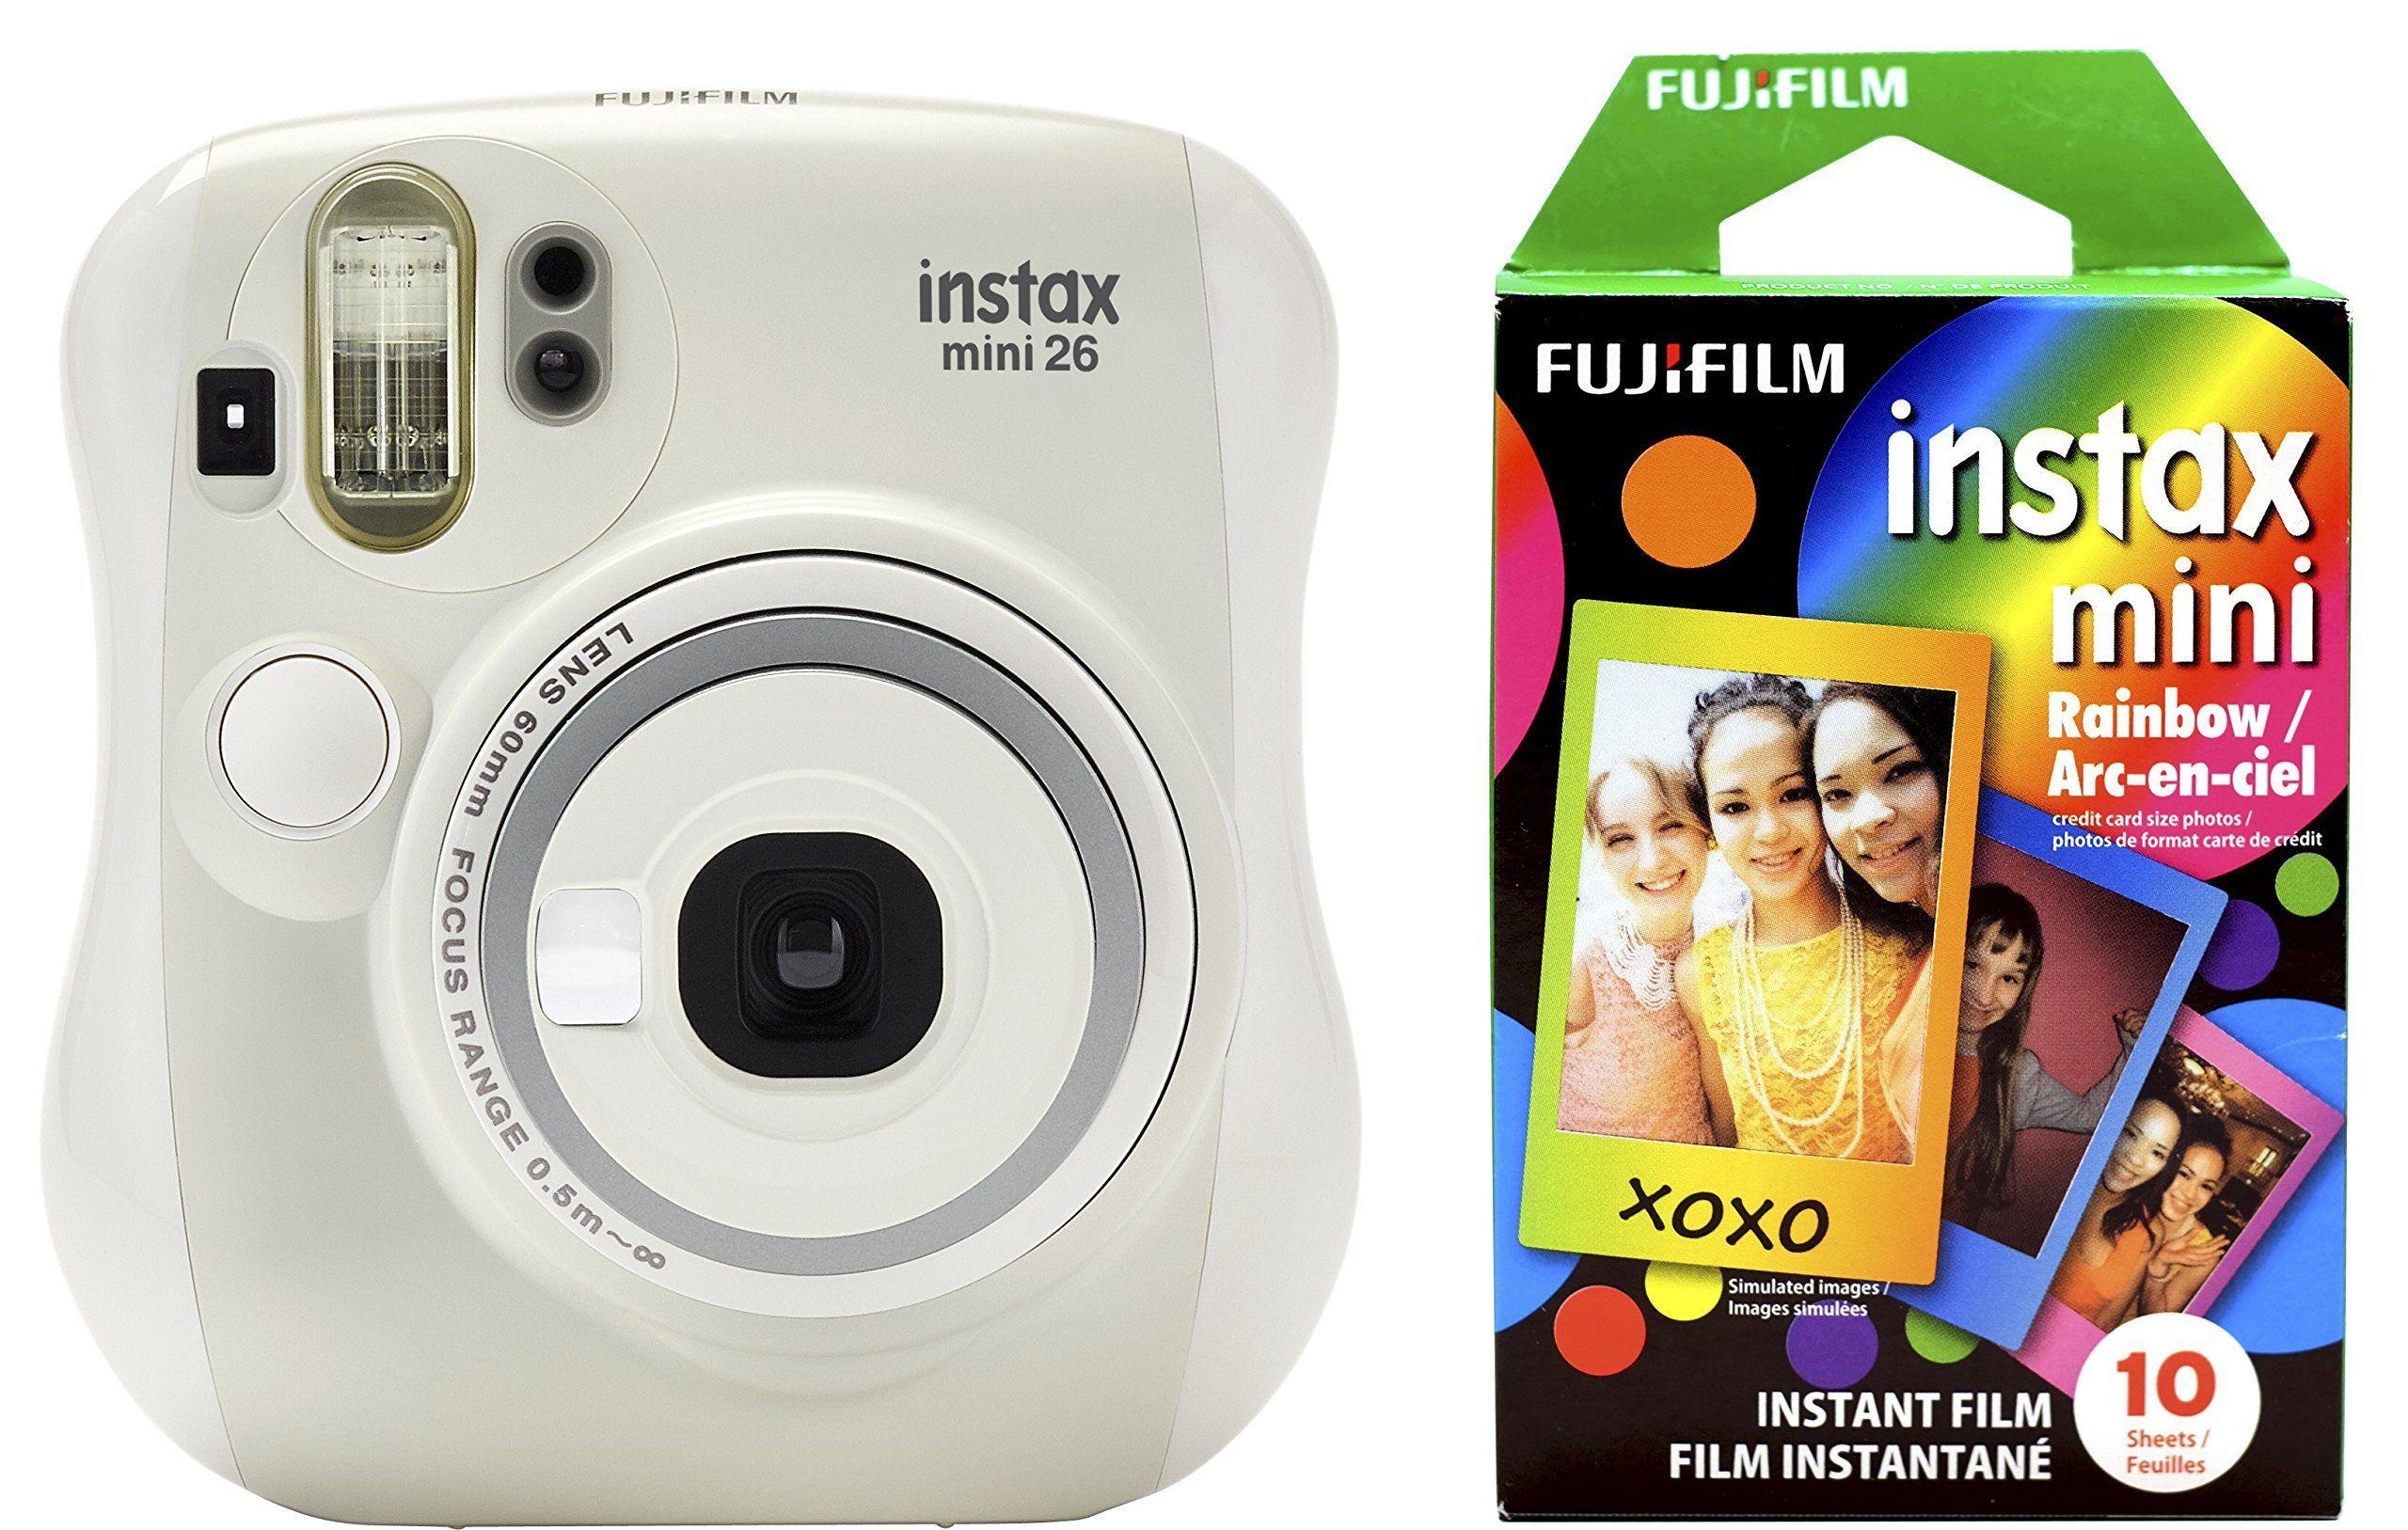 Fujifilm Instax Mini 26 Rainbow Film Bundle White Fujifilm